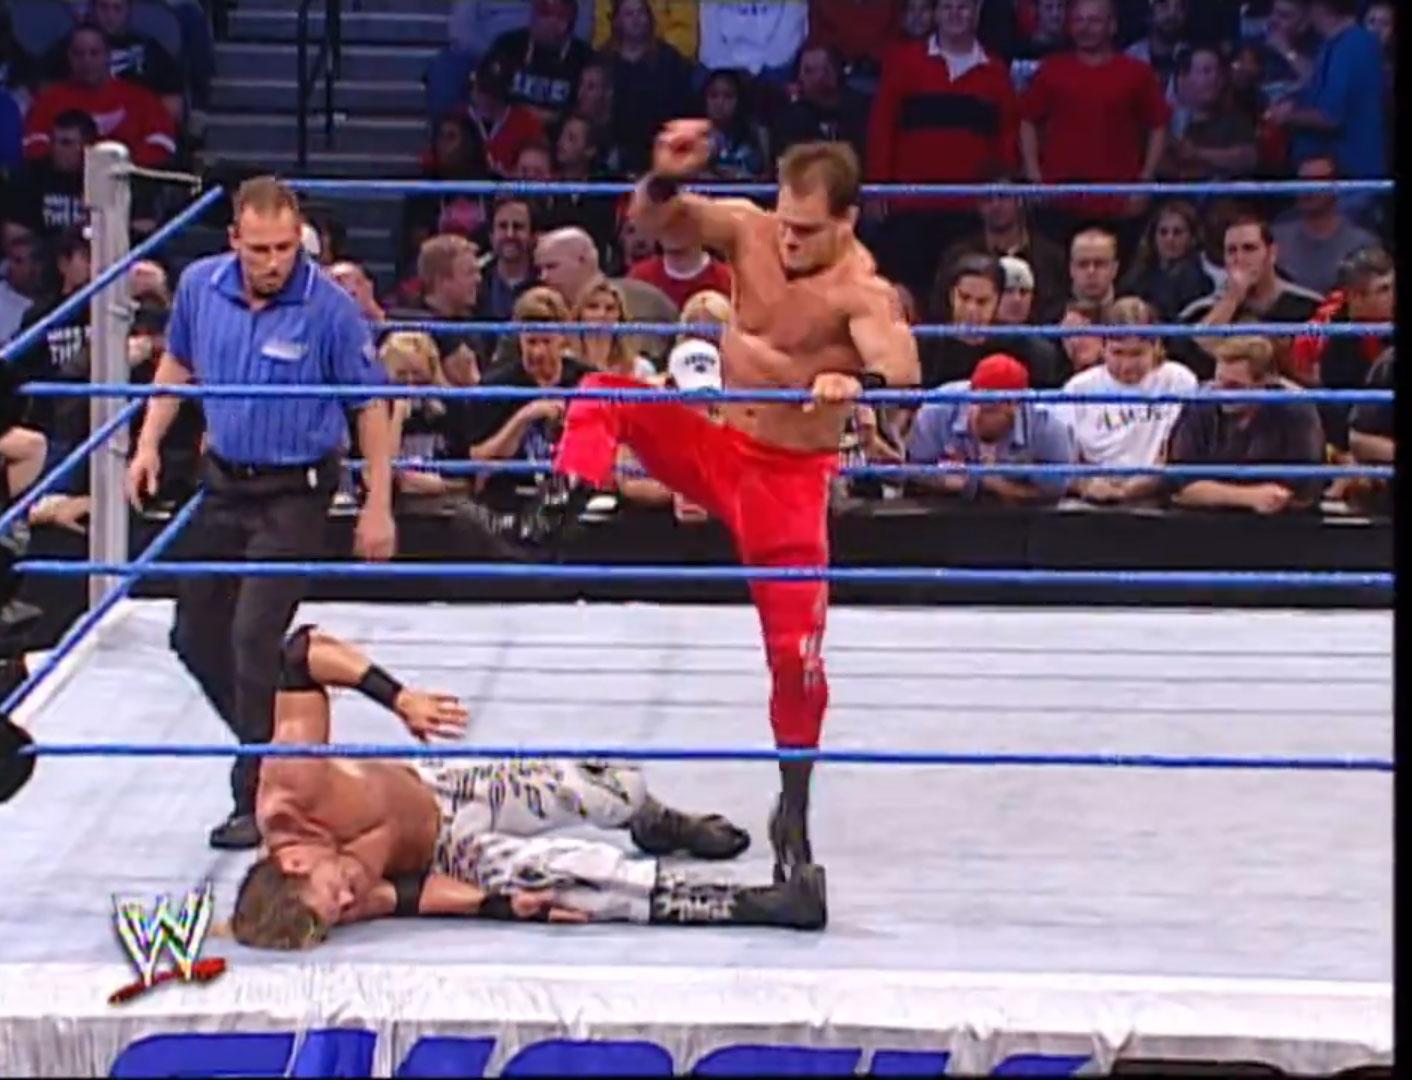 Kurt Angle vs. Chris Benoit vs. Eddie Guerrero vs. Edge Four-Way Elimination WWE Smackdown, Dec 5th 2002